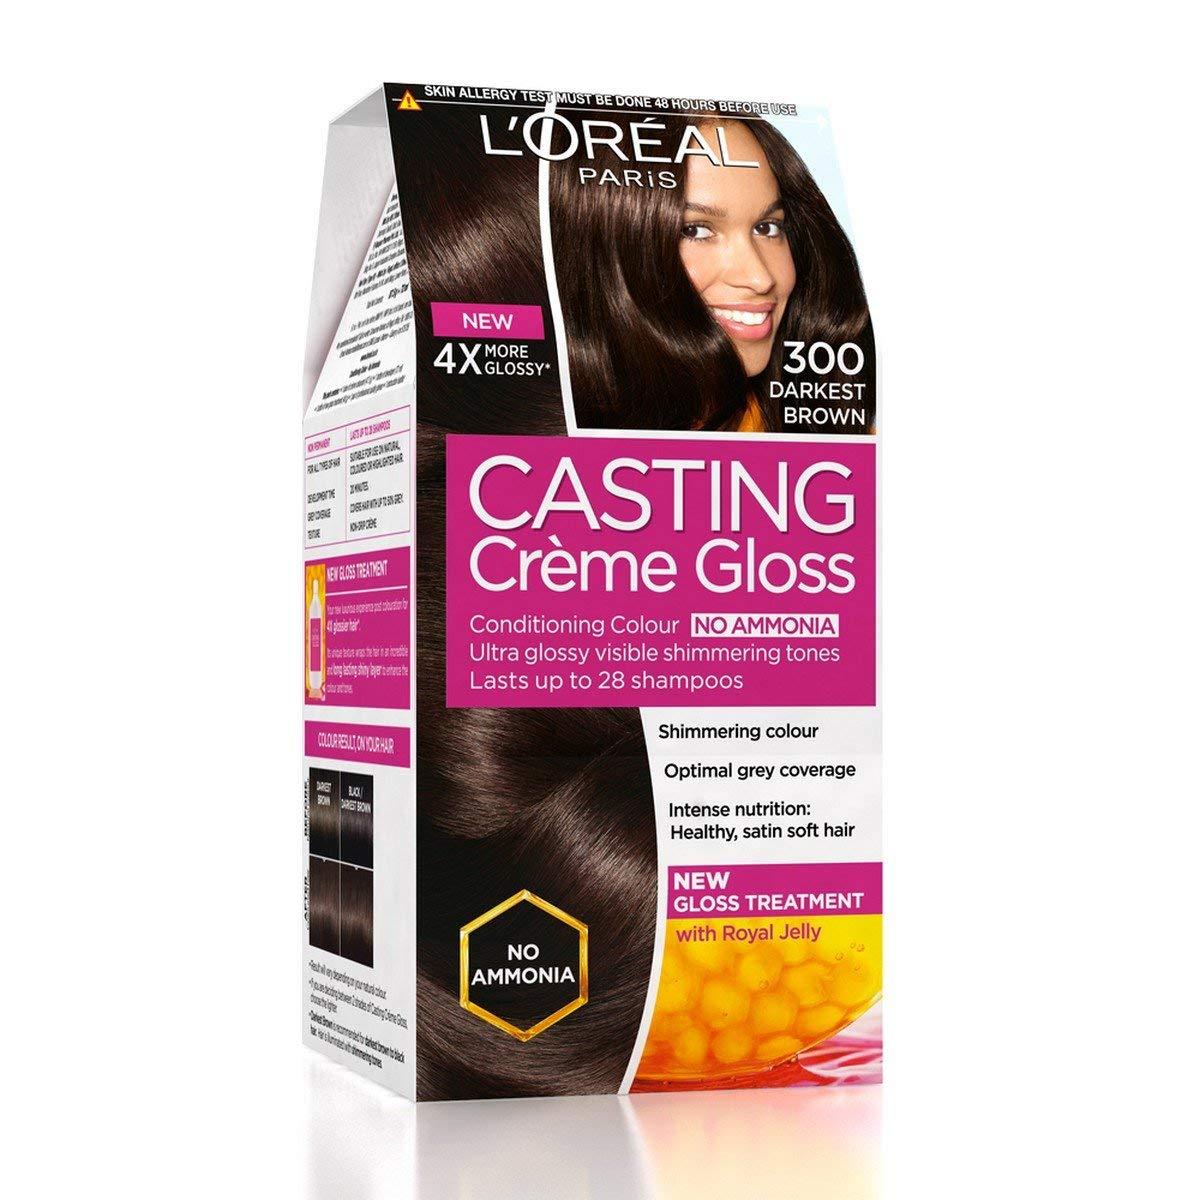 L'Oreal Paris Casting Creme Gloss Hair Color Image